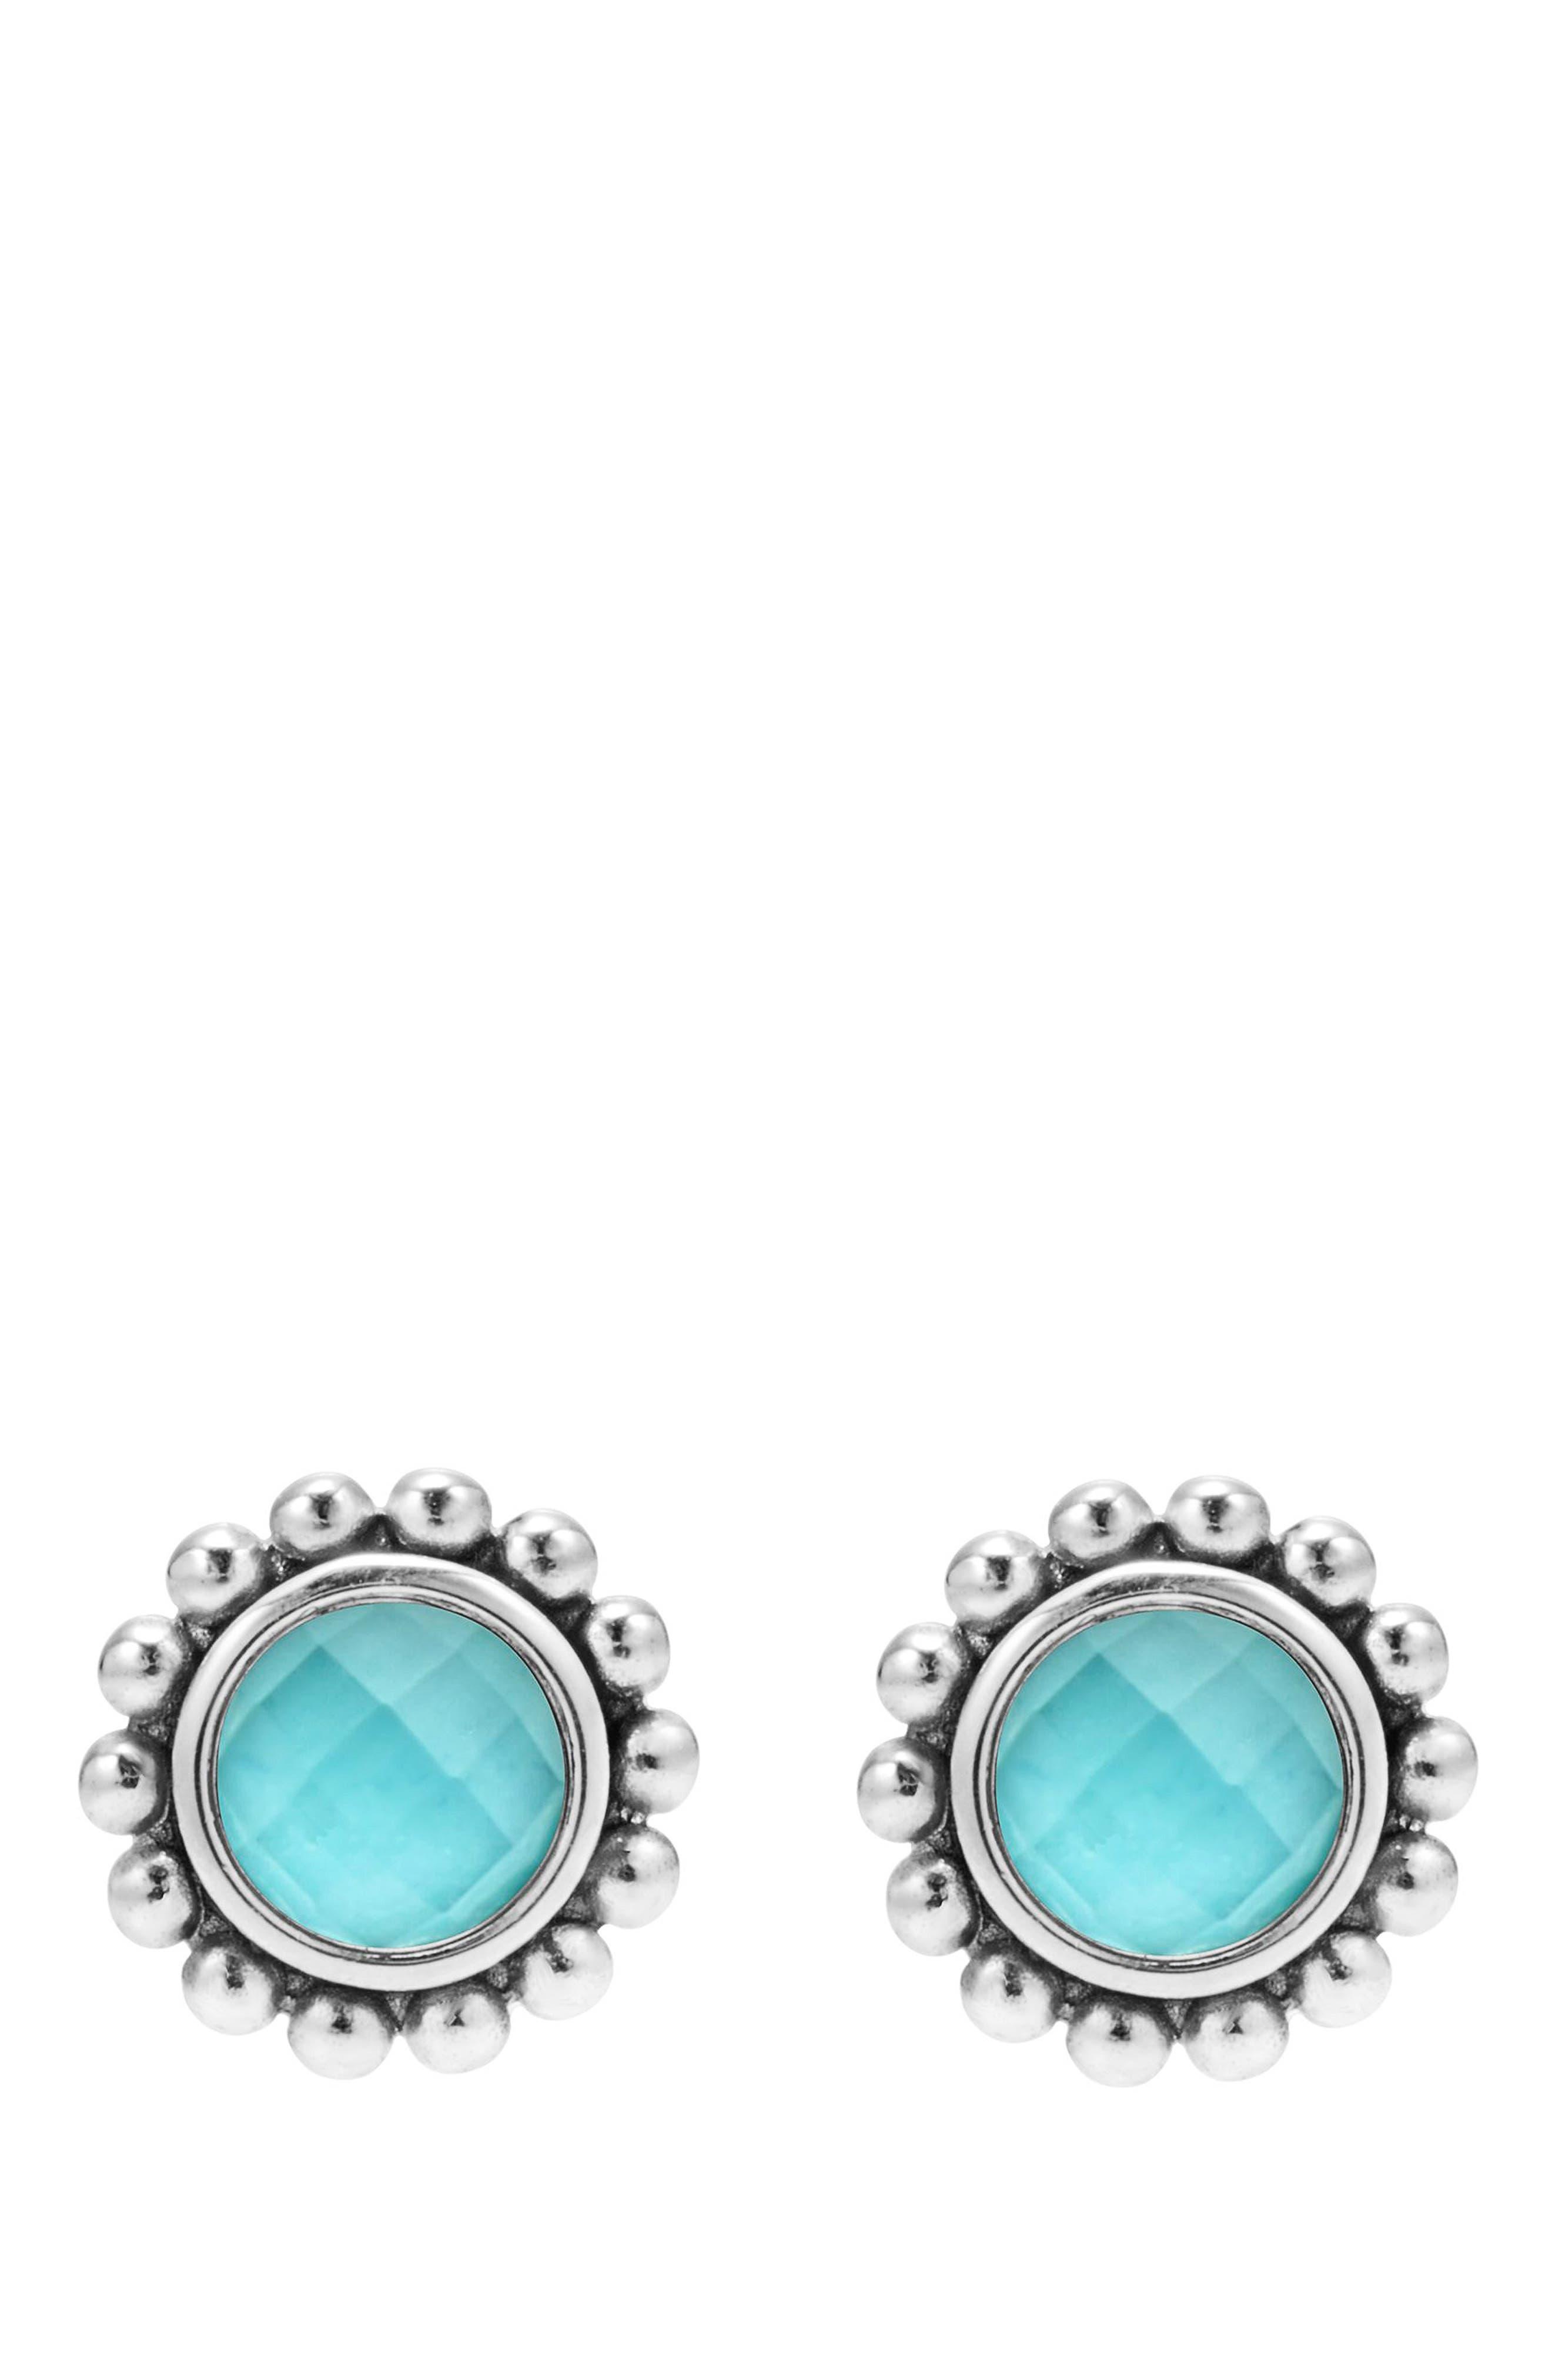 Maya Doublet Stud Earrings,                             Alternate thumbnail 2, color,                             TURQUOISE